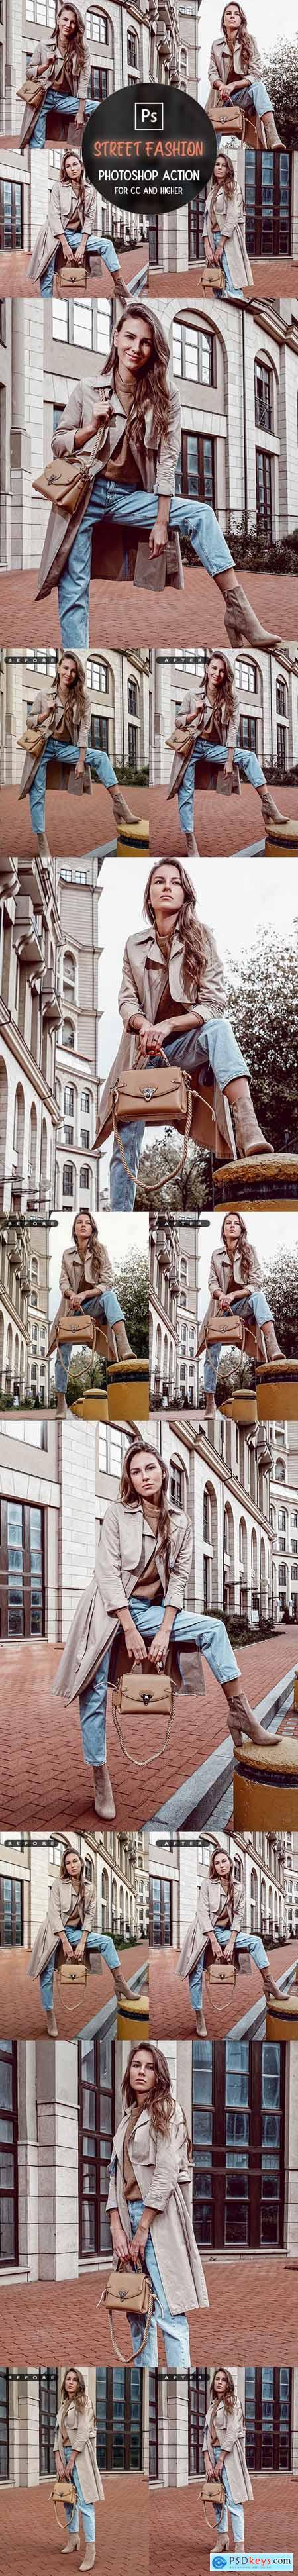 Street Fashion - Photoshop Action 29950944